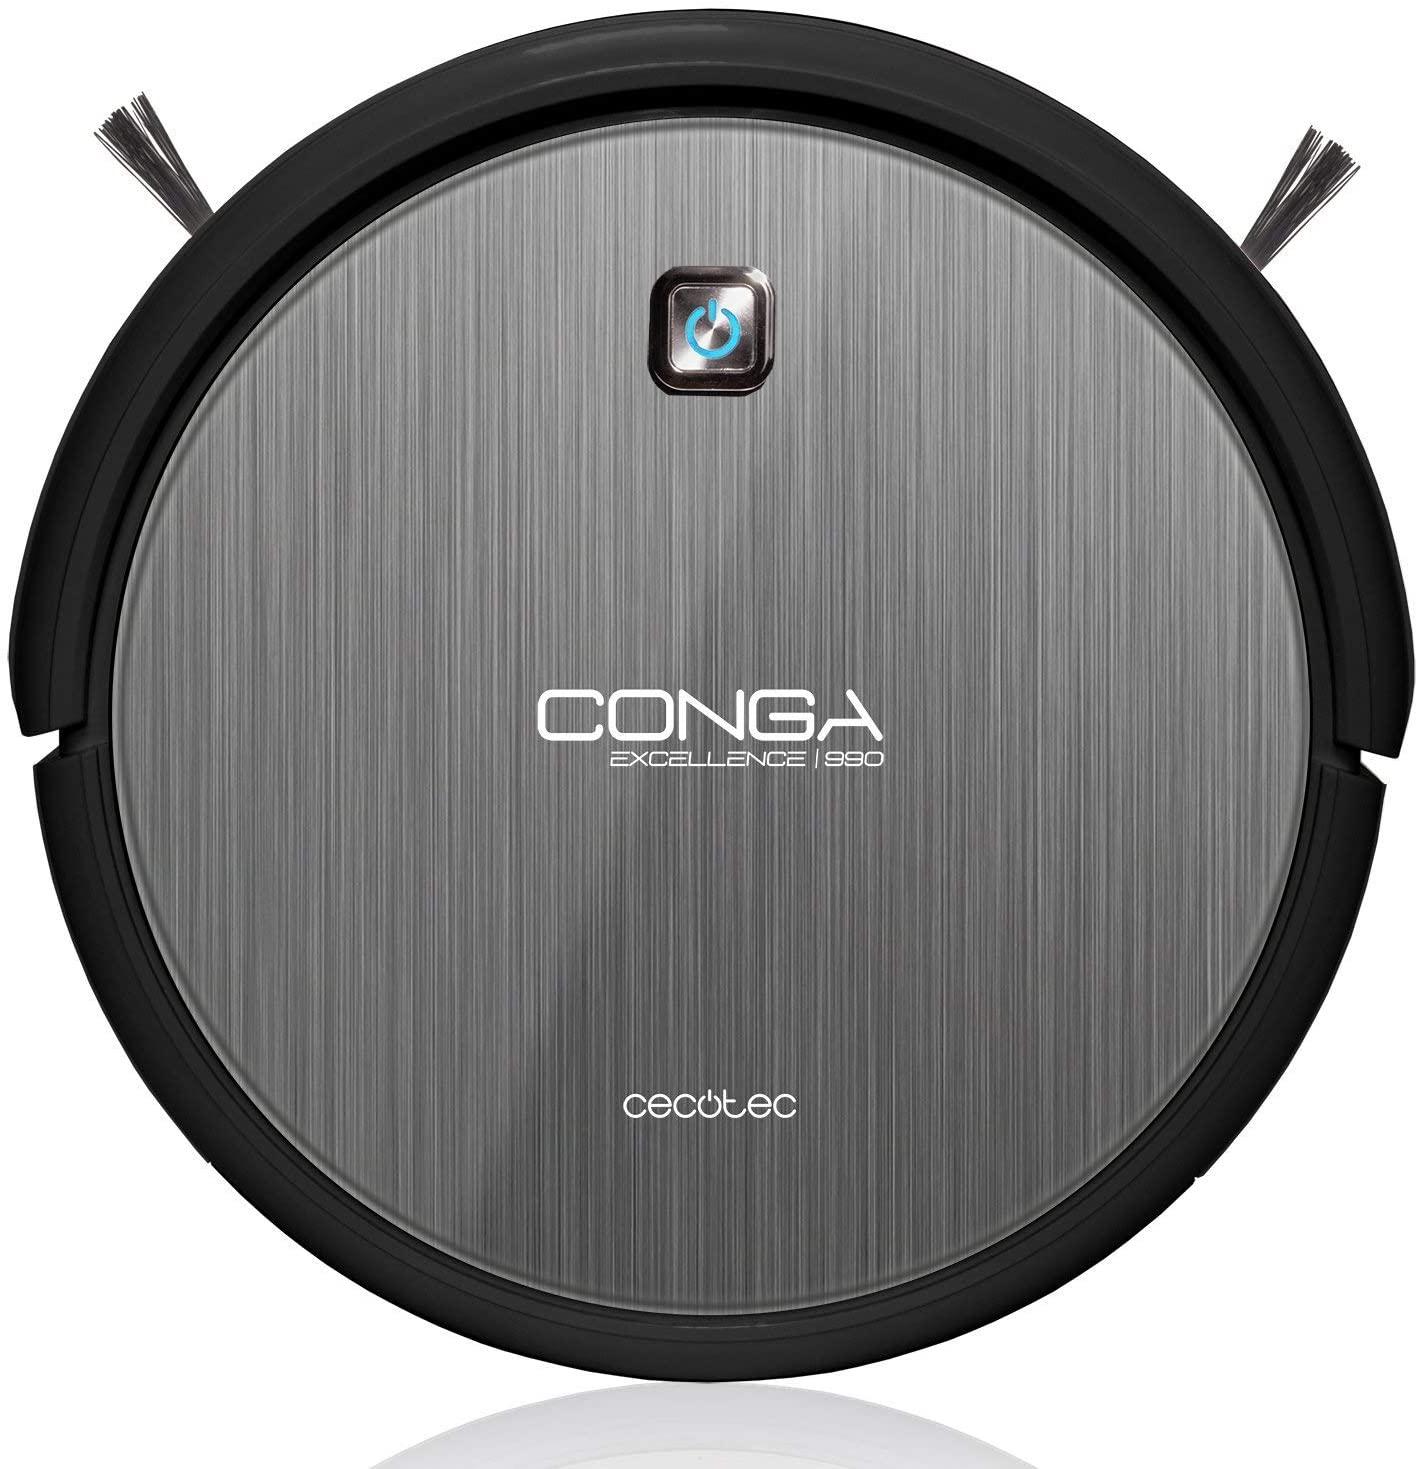 Conga Excellence 990 Amazon